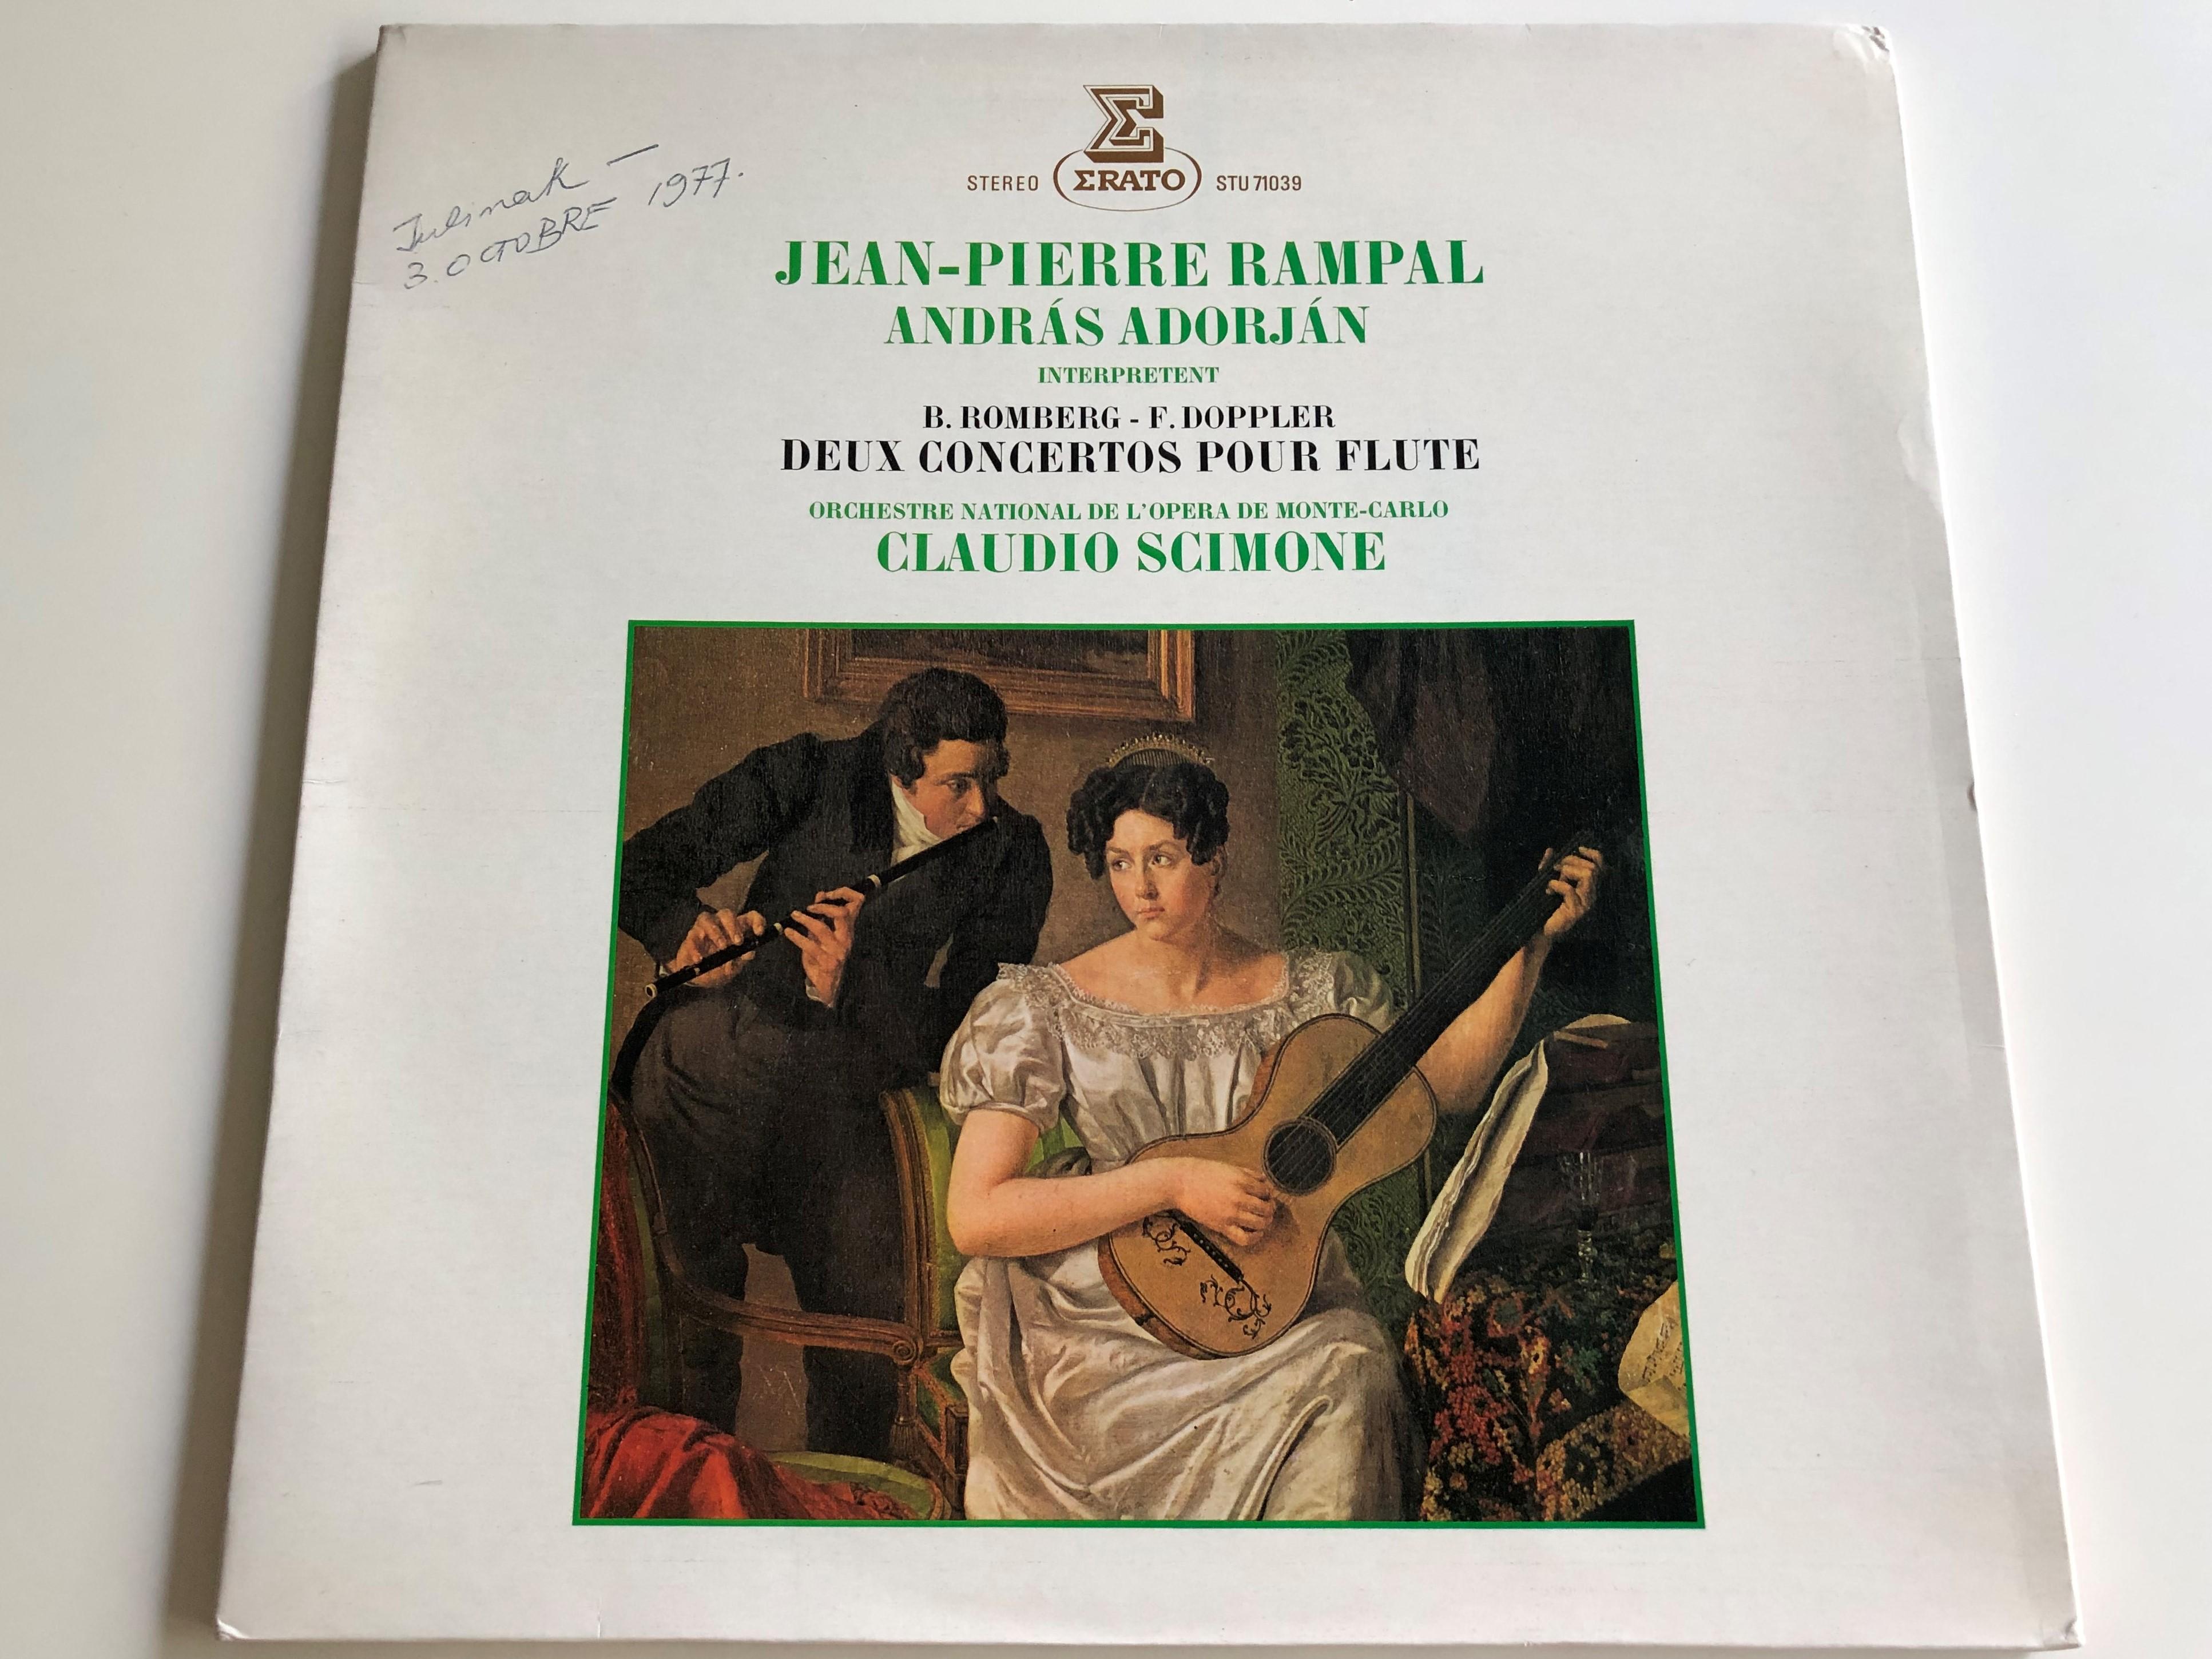 jean-pierre-rampal-andras-adorjan-interpretent-b.-romberg-f.-doppler-deux-concertos-pour-flute-orchestre-national-de-l-opera-de-monte-carlo-claudio-scimone-erato-lp-steereo-stu-71039-1-.jpg